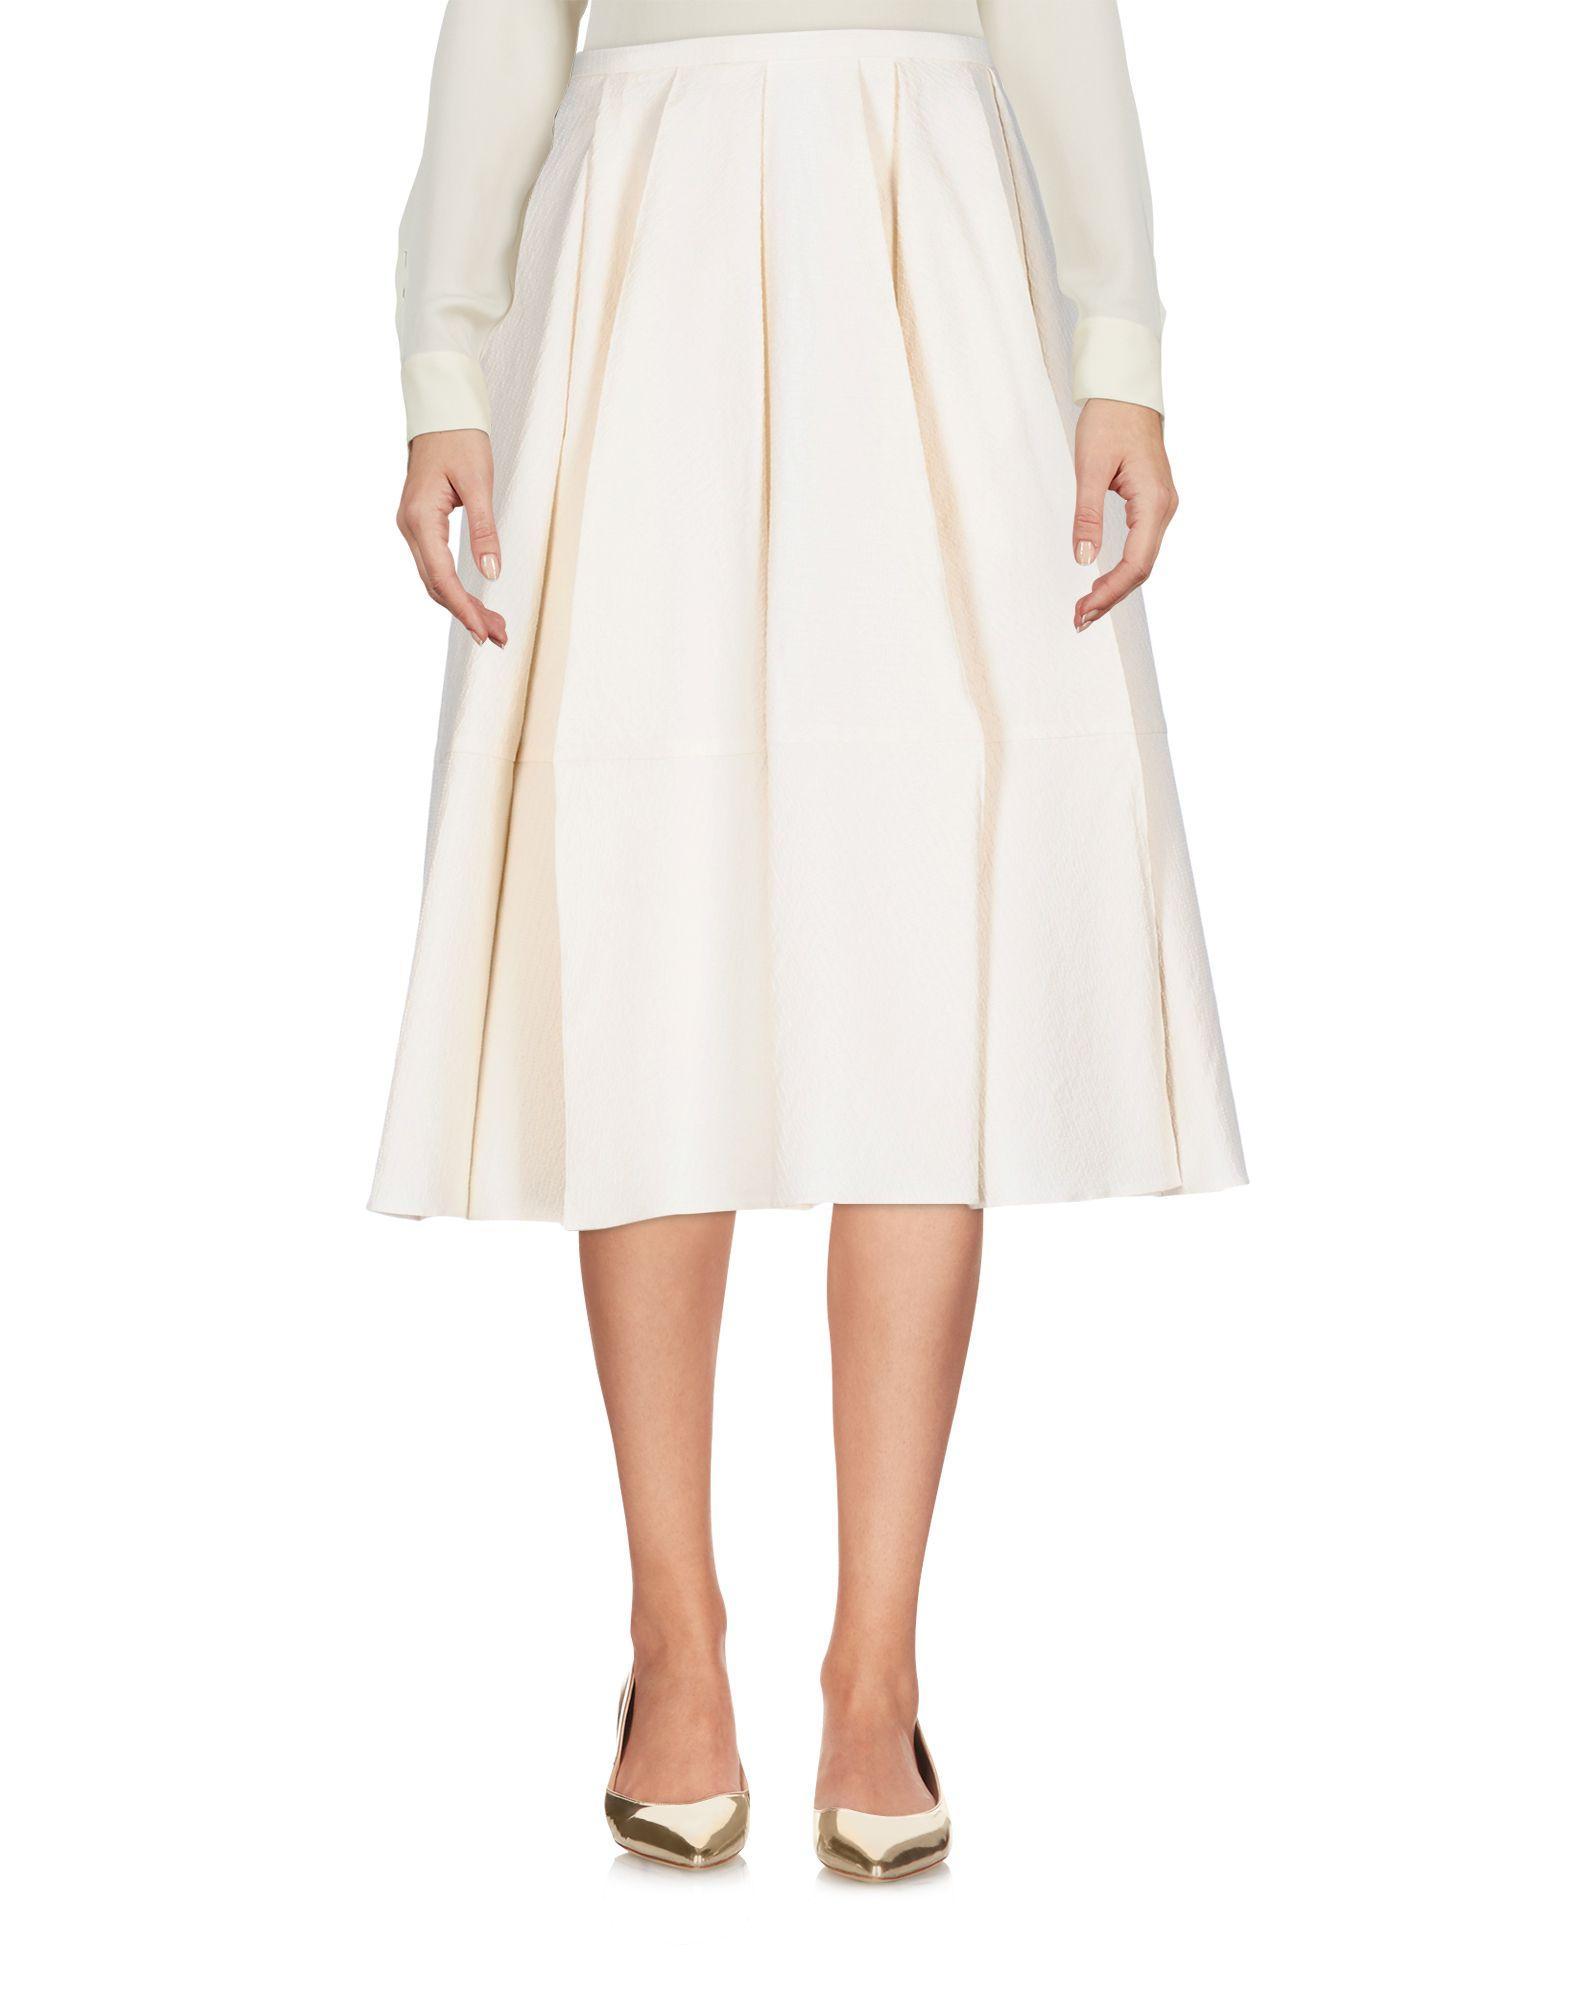 Veronique Leroy 3/4 Length Skirts In Beige